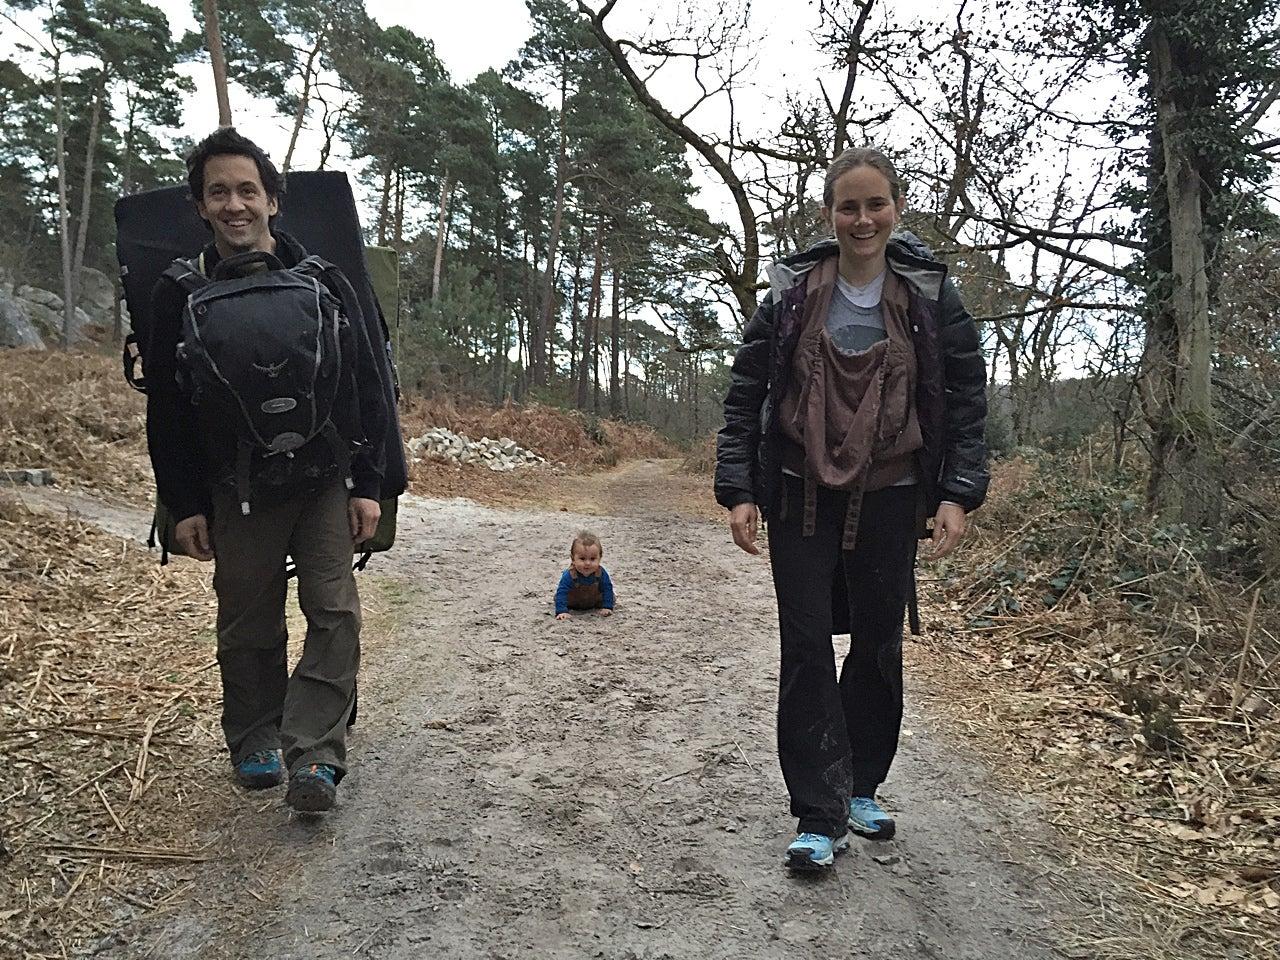 Ask Beth Rodden: Taking Kids On International Climbing Trips